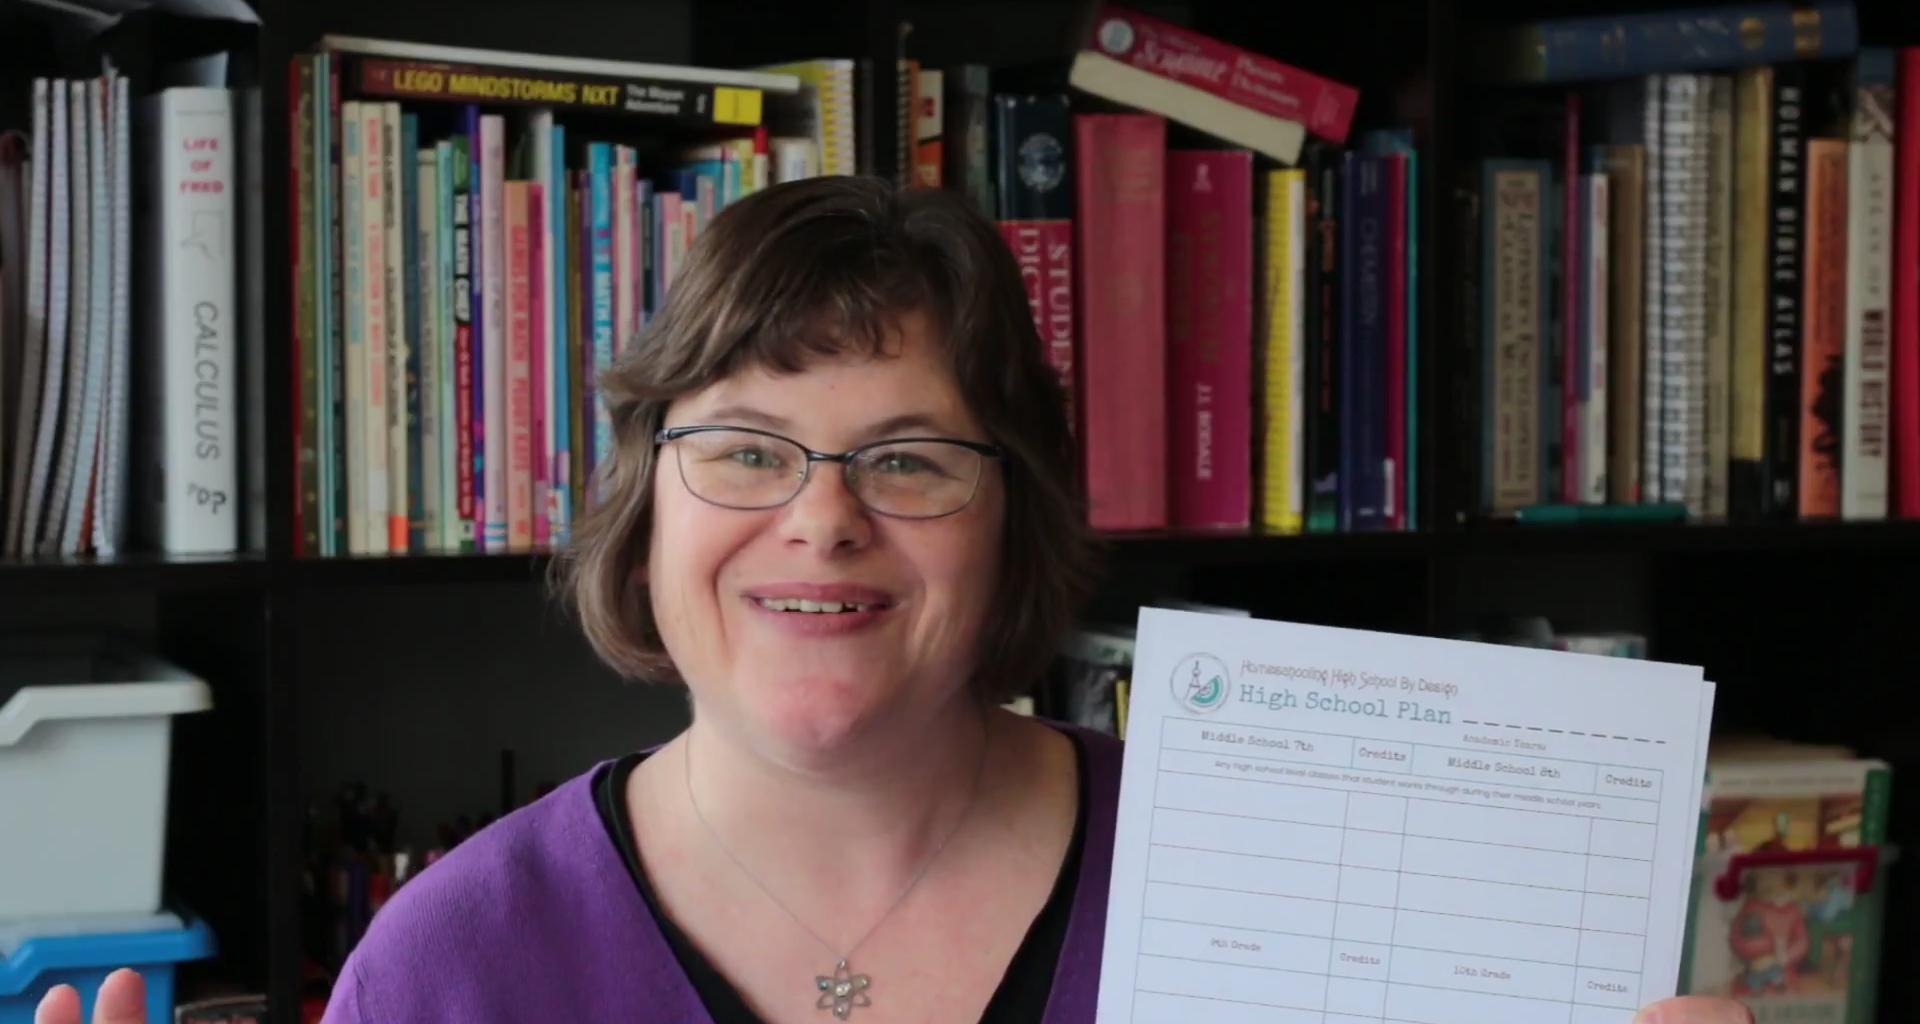 Homeschooling High School by Design- woman holding up a plan sheet